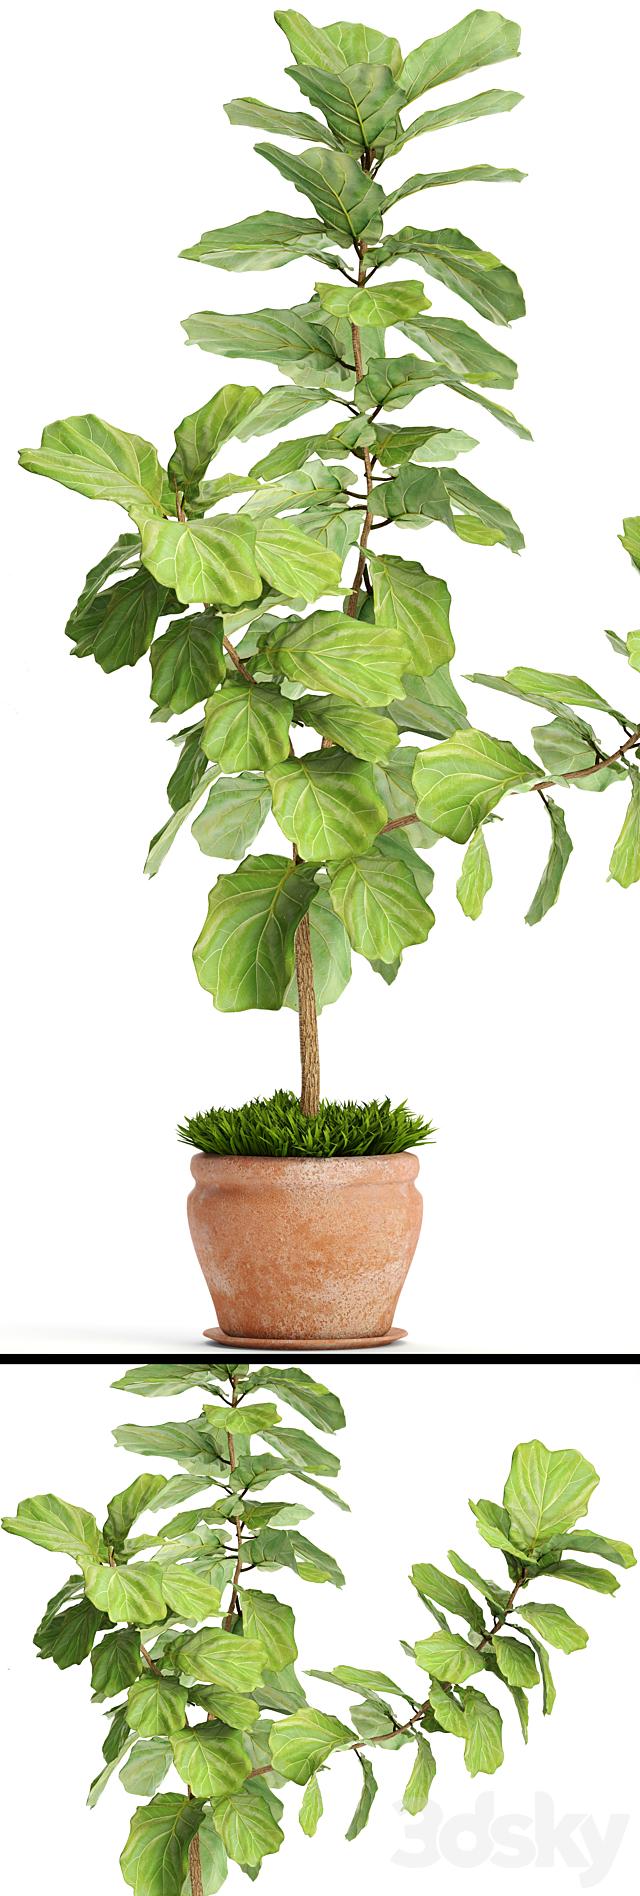 Ficus lyrata. Collection. 3